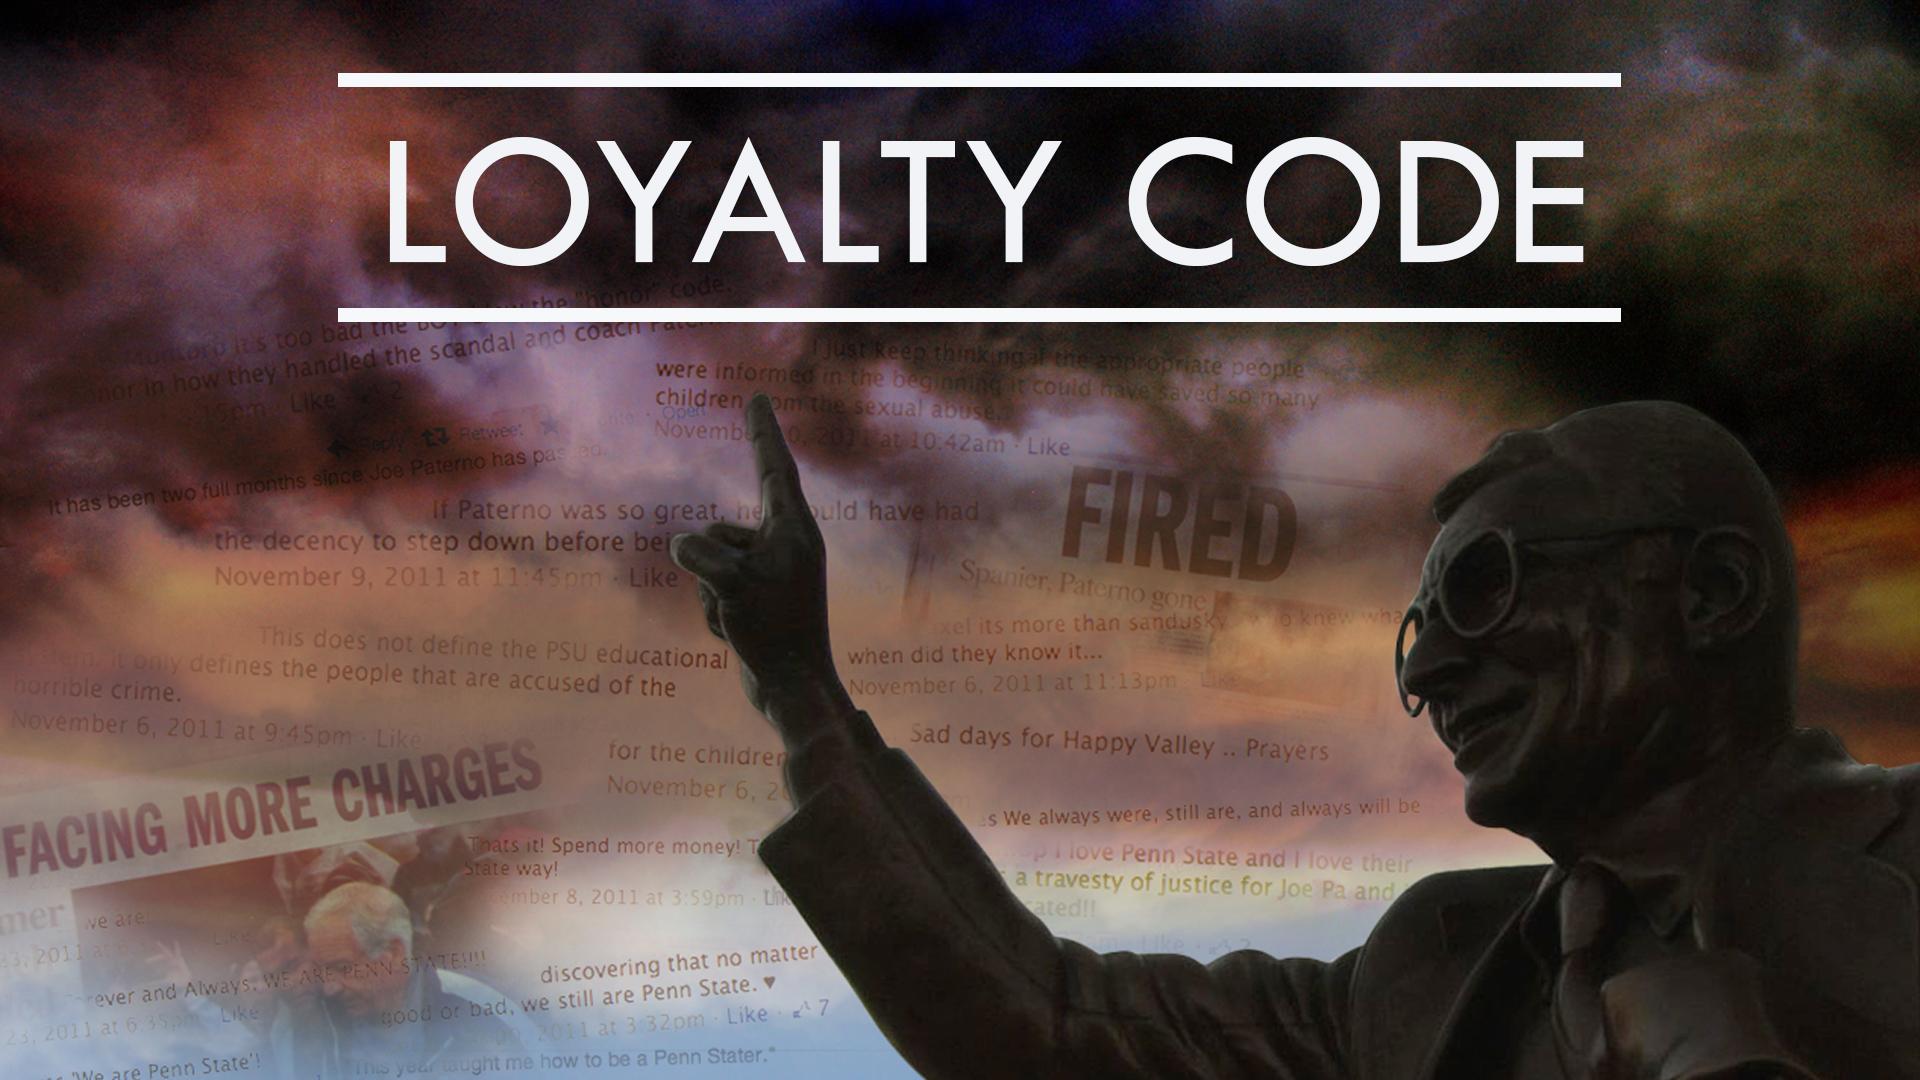 Loyalty Code